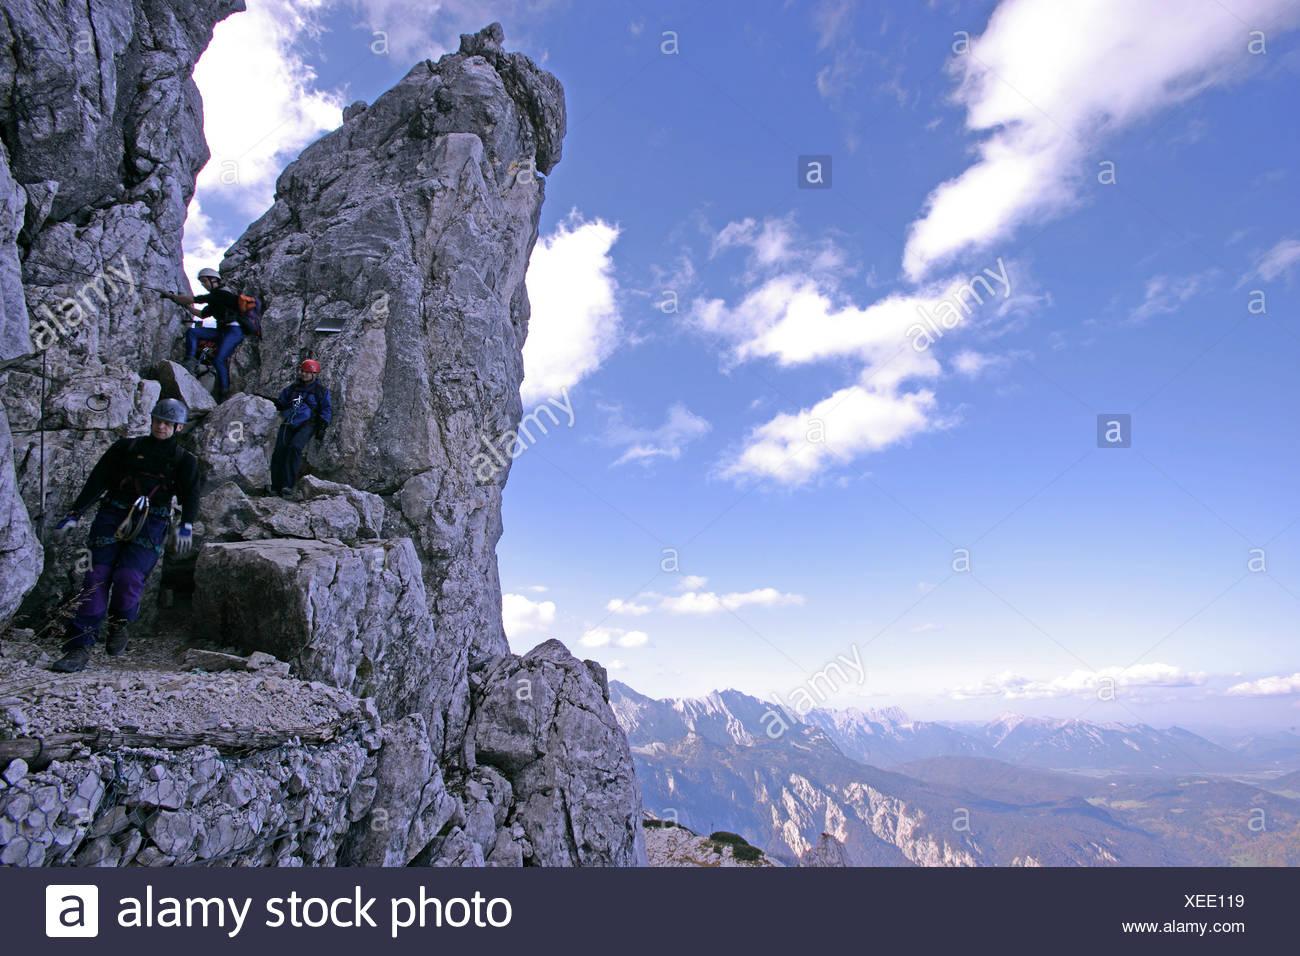 hikers on mounth alpspitze wetterstein range bavaria germany